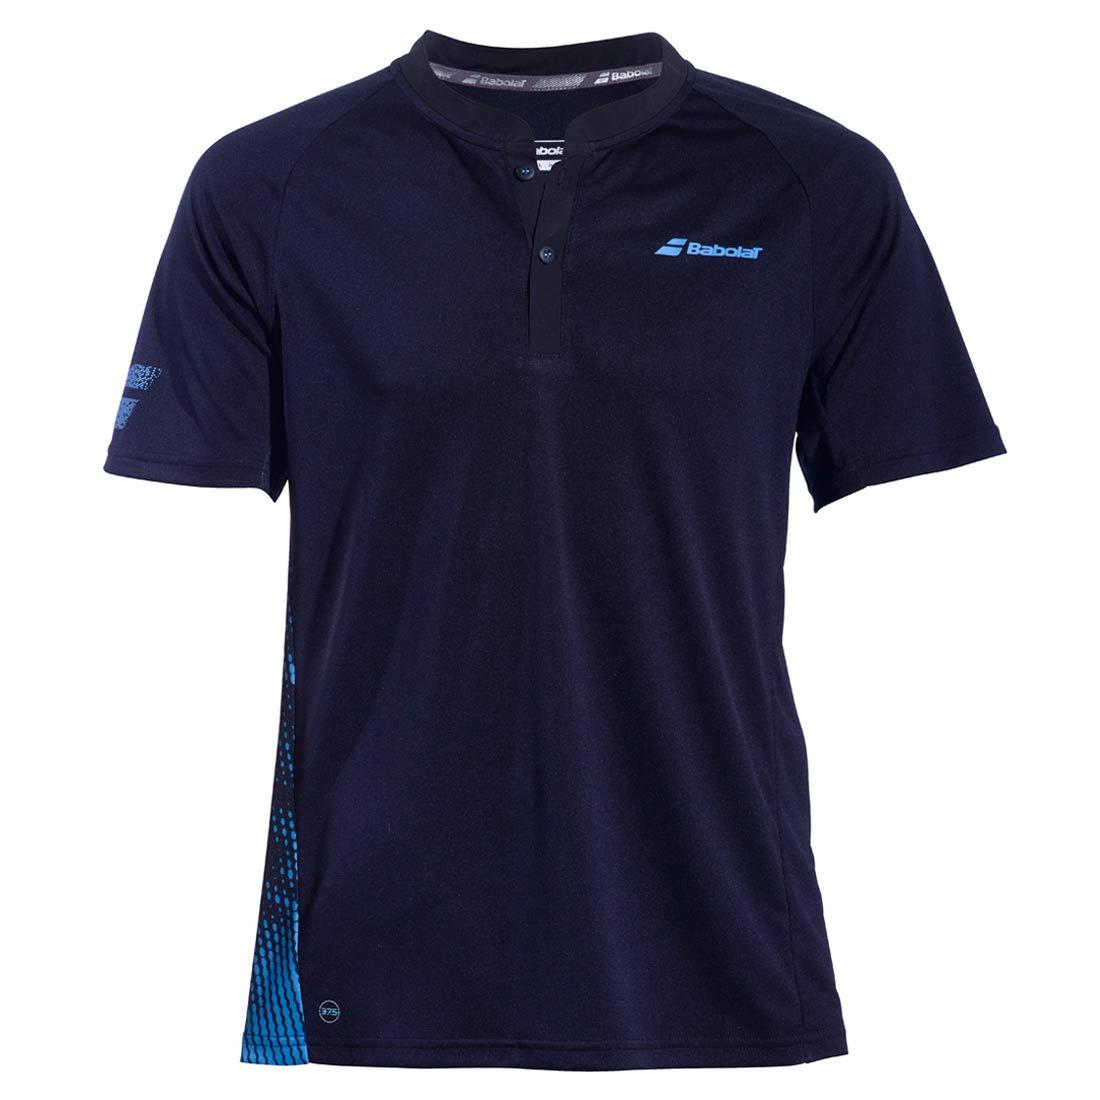 Babolat Mens Performance Lightweight Breathable Tennis Polo Shirt, Black/Parisian Blue (Small)